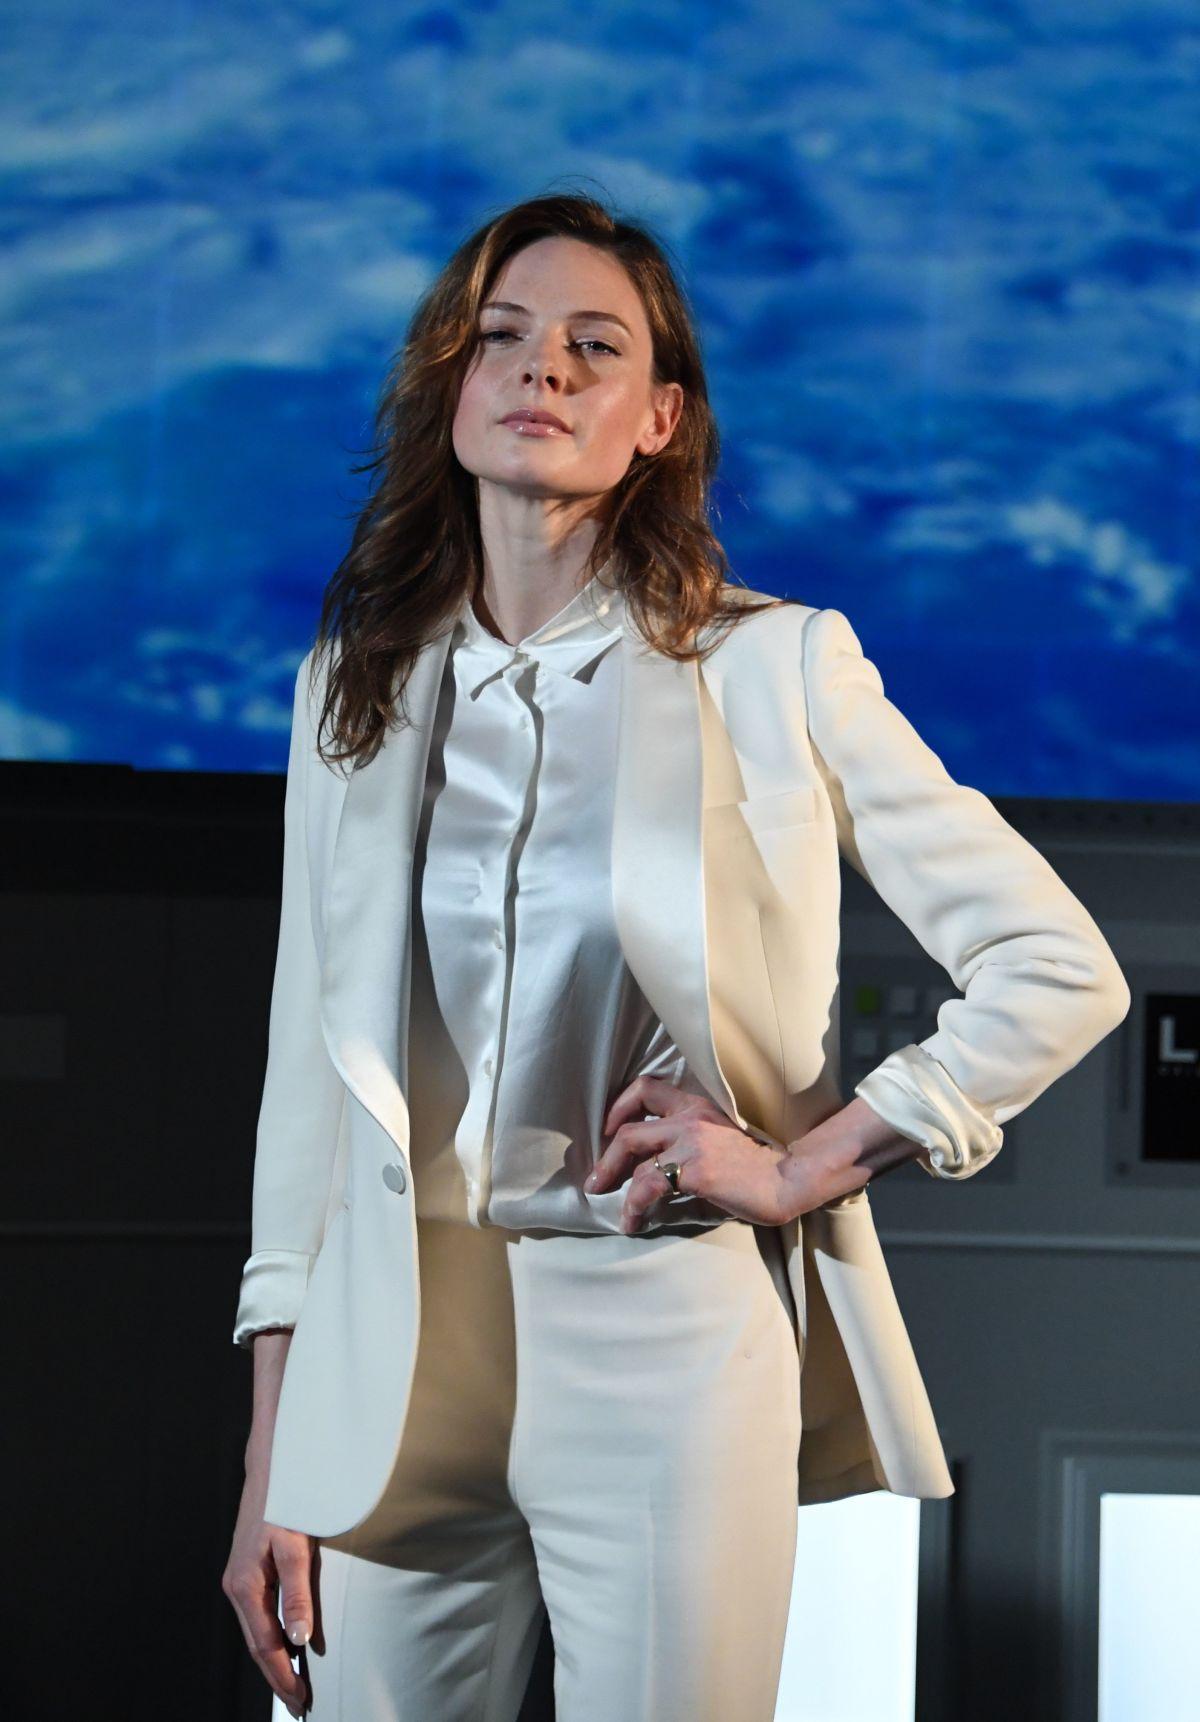 REBECCA FERGUSON at Life Photocall in Paris 03/13/2017 ...